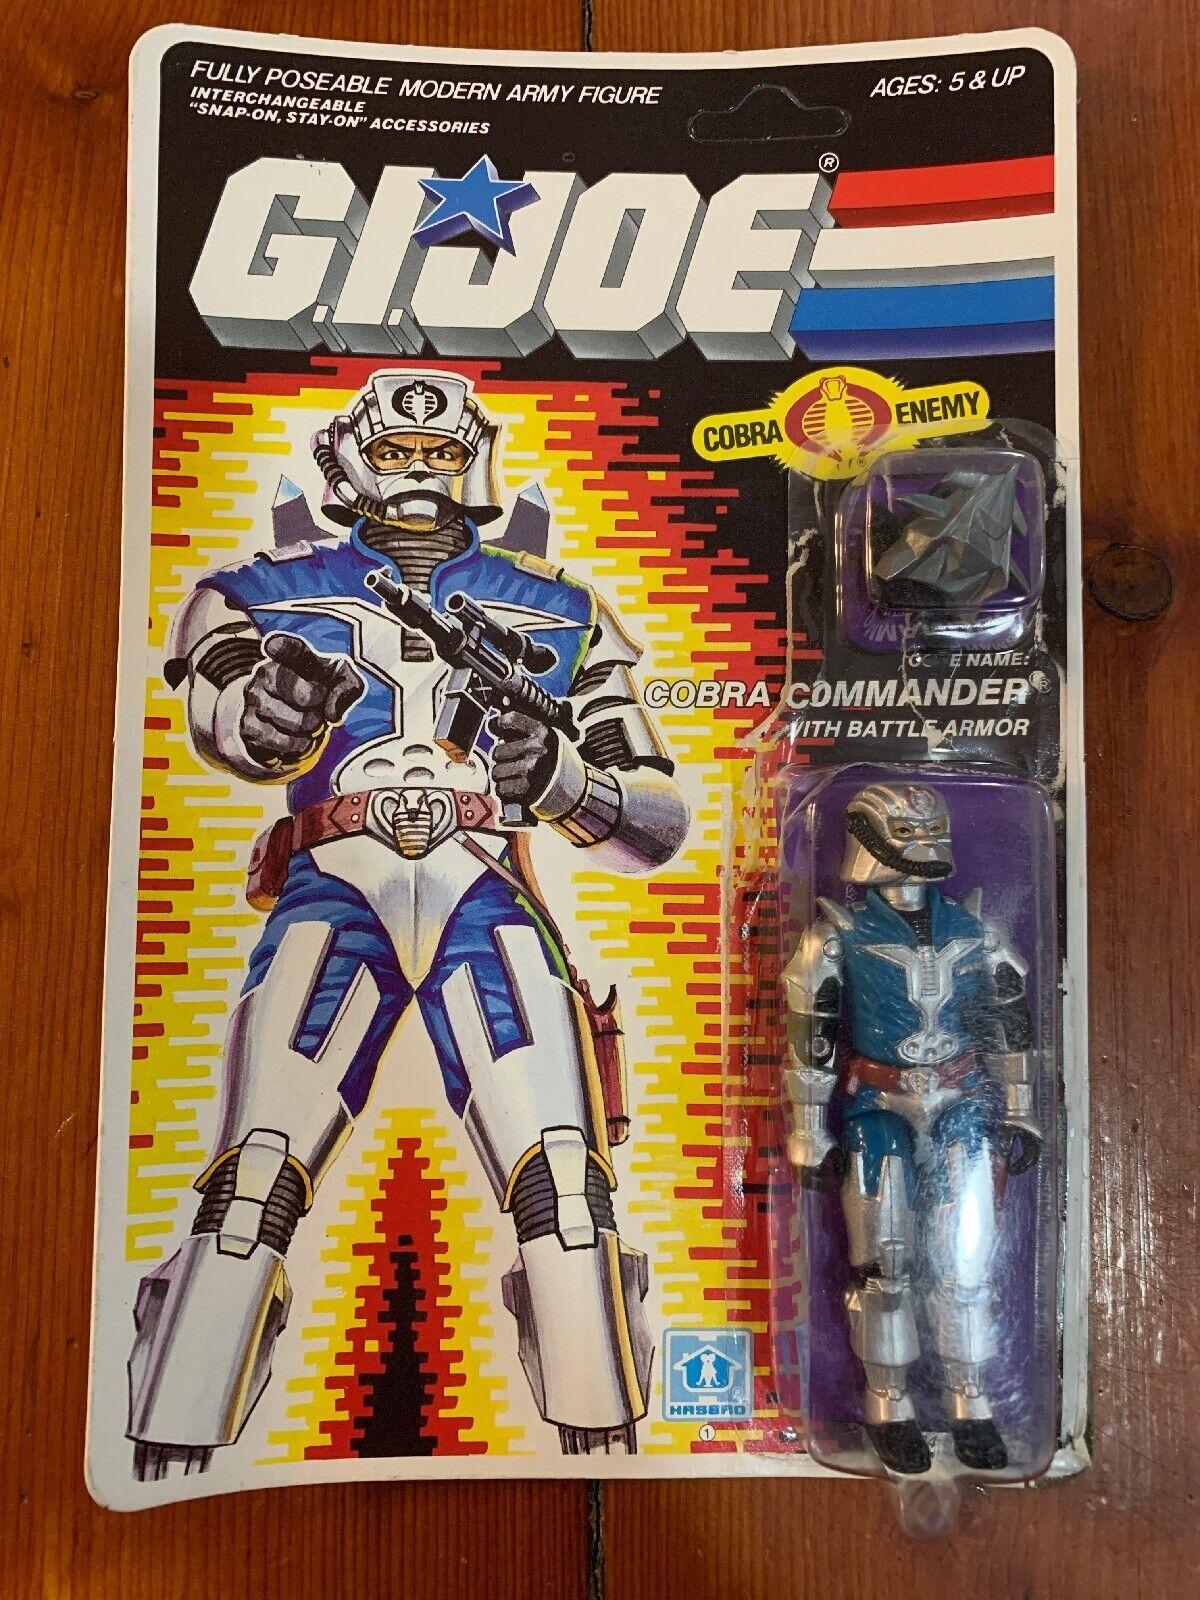 G.I. Joe 1987 Vintage Hasbro Cobra Commander un verdadero héroe americano original completa en tarjeta